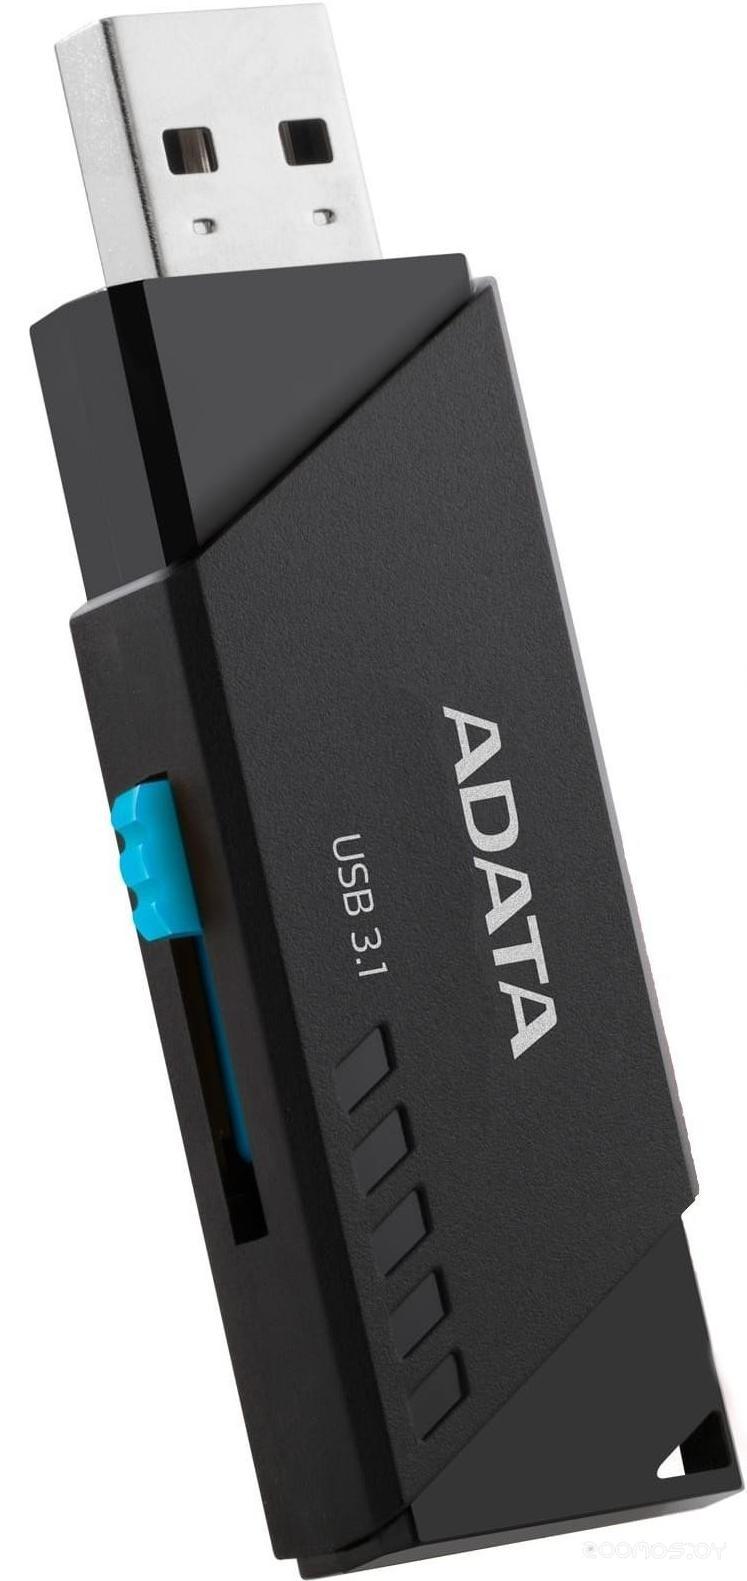 USB Flash A-Data UV330 32GB (Black)